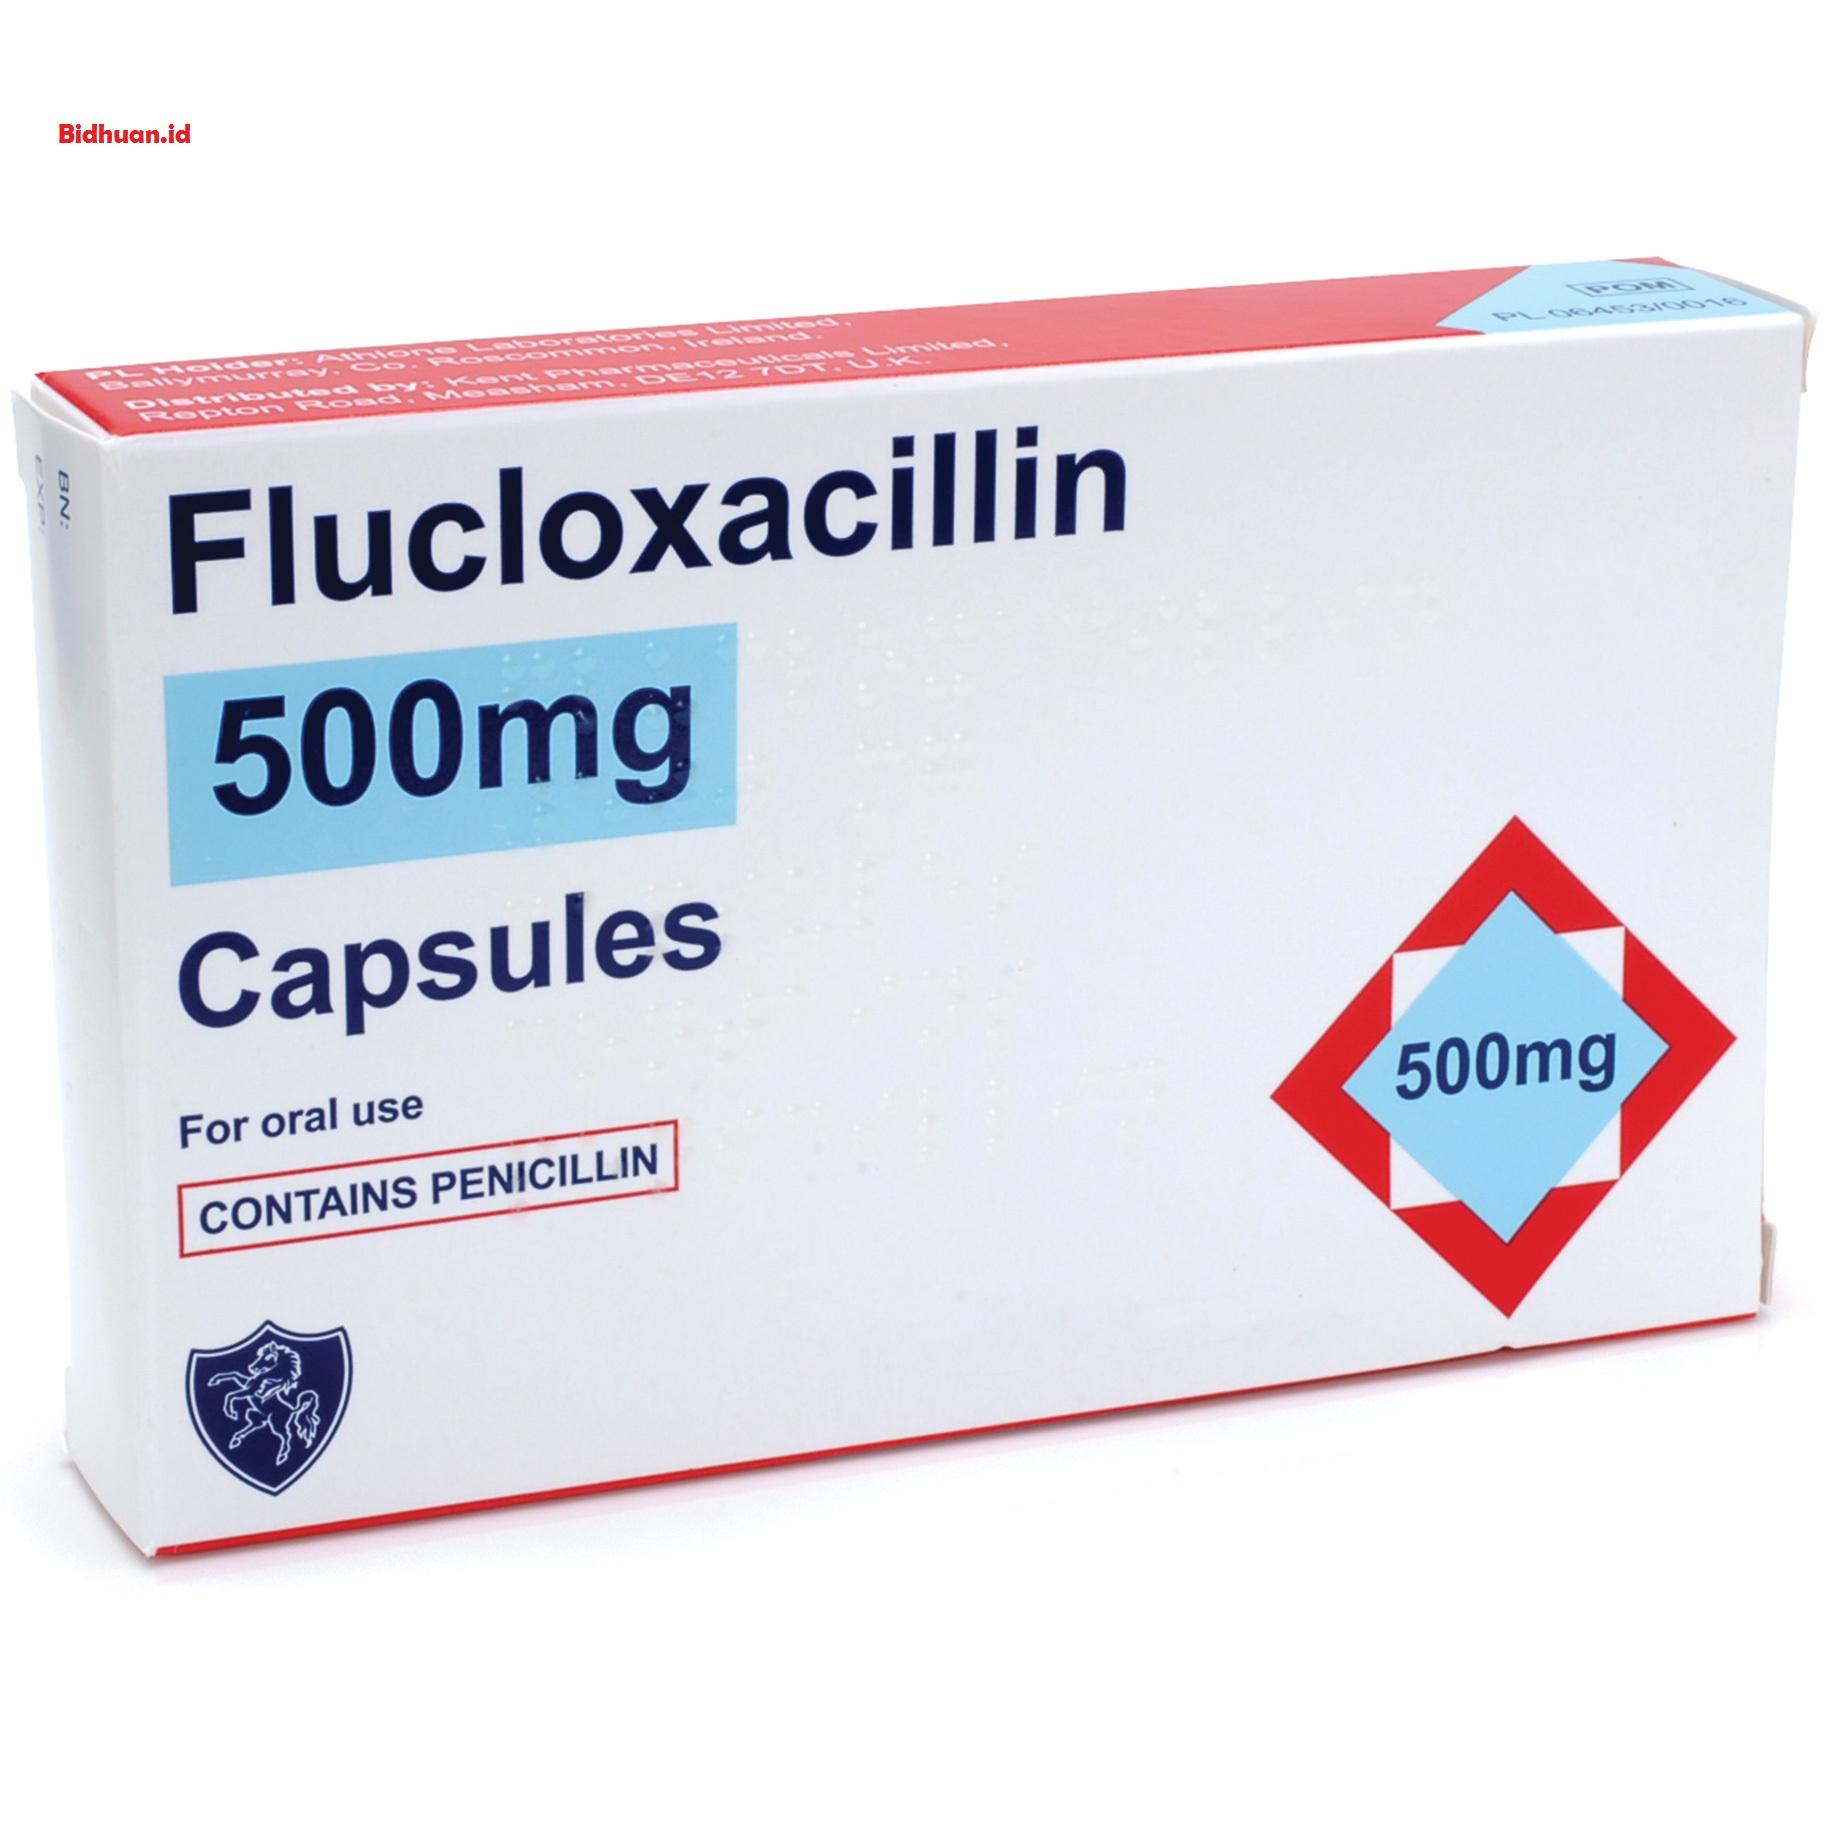 Flucloxacillin untuk pengobatan bisul paling efektif